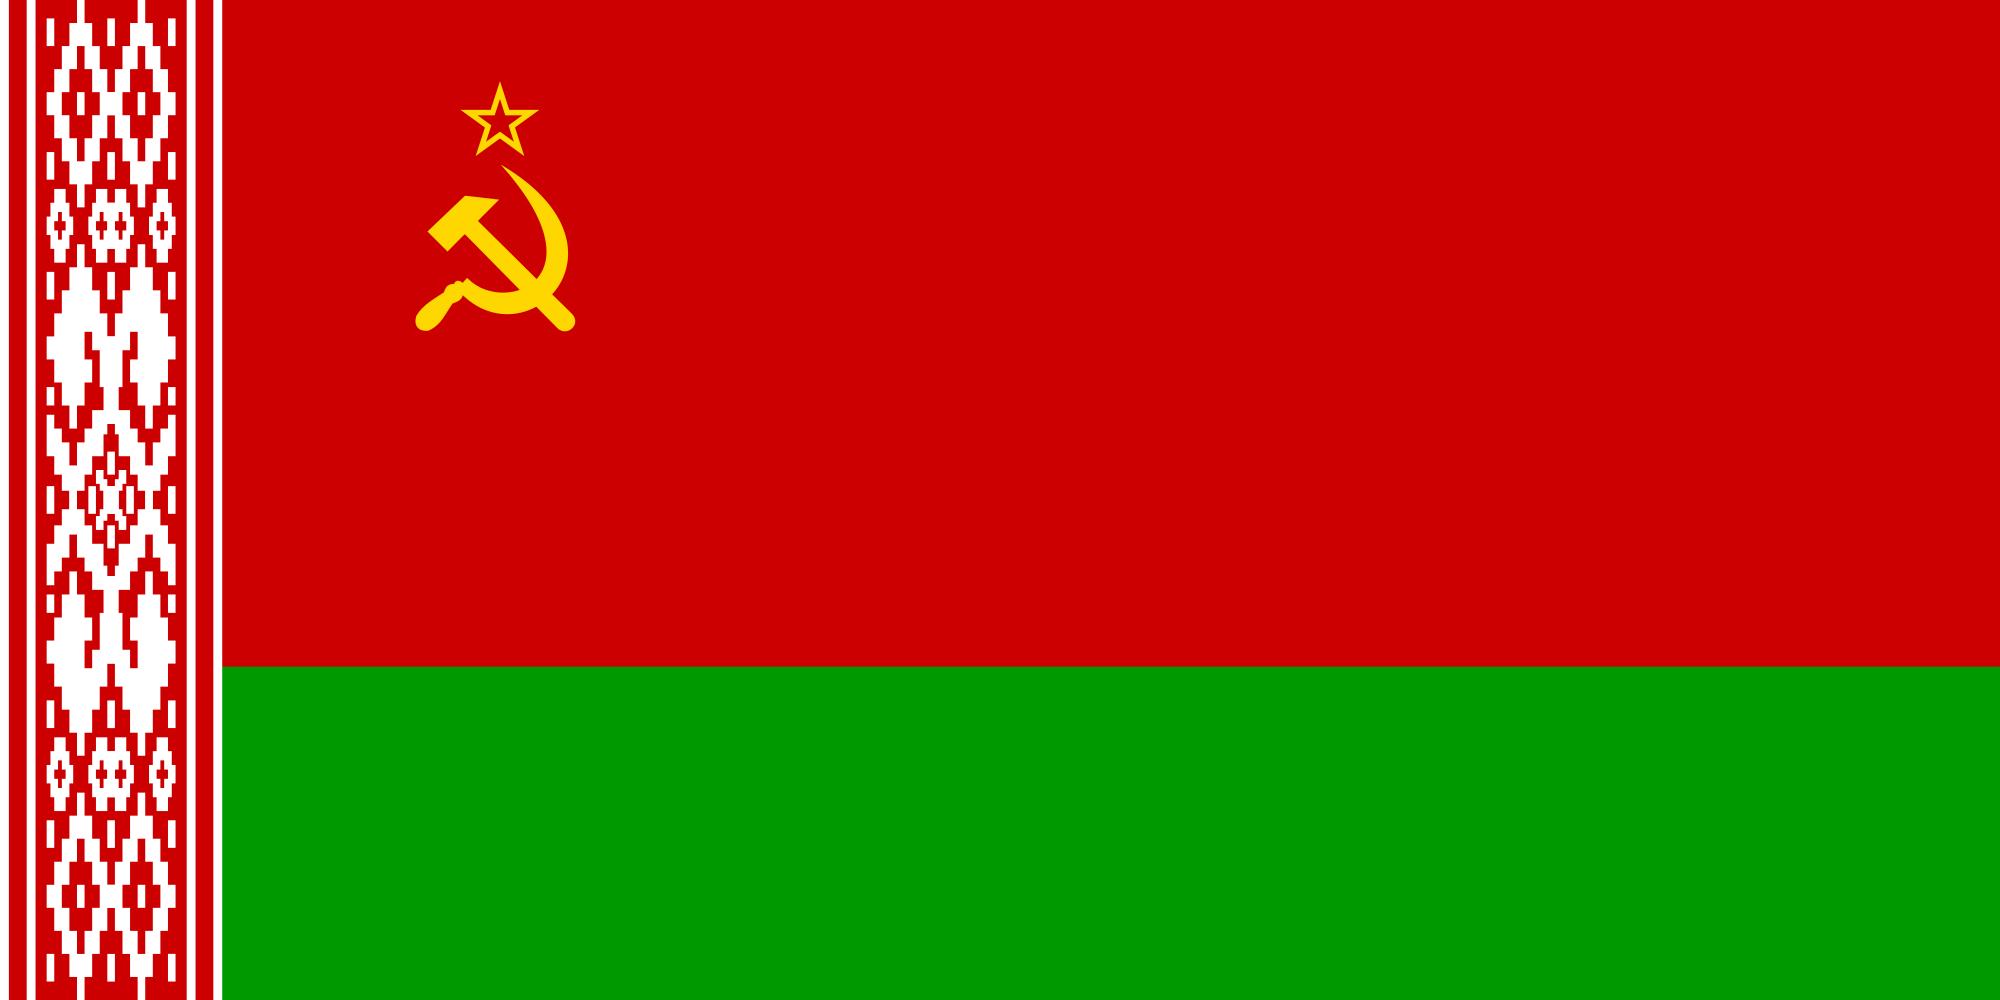 Flag Of The Byelorussian Soviet Socialist Republic Soviet Socialist Republic Flags Of The World Russian Flag